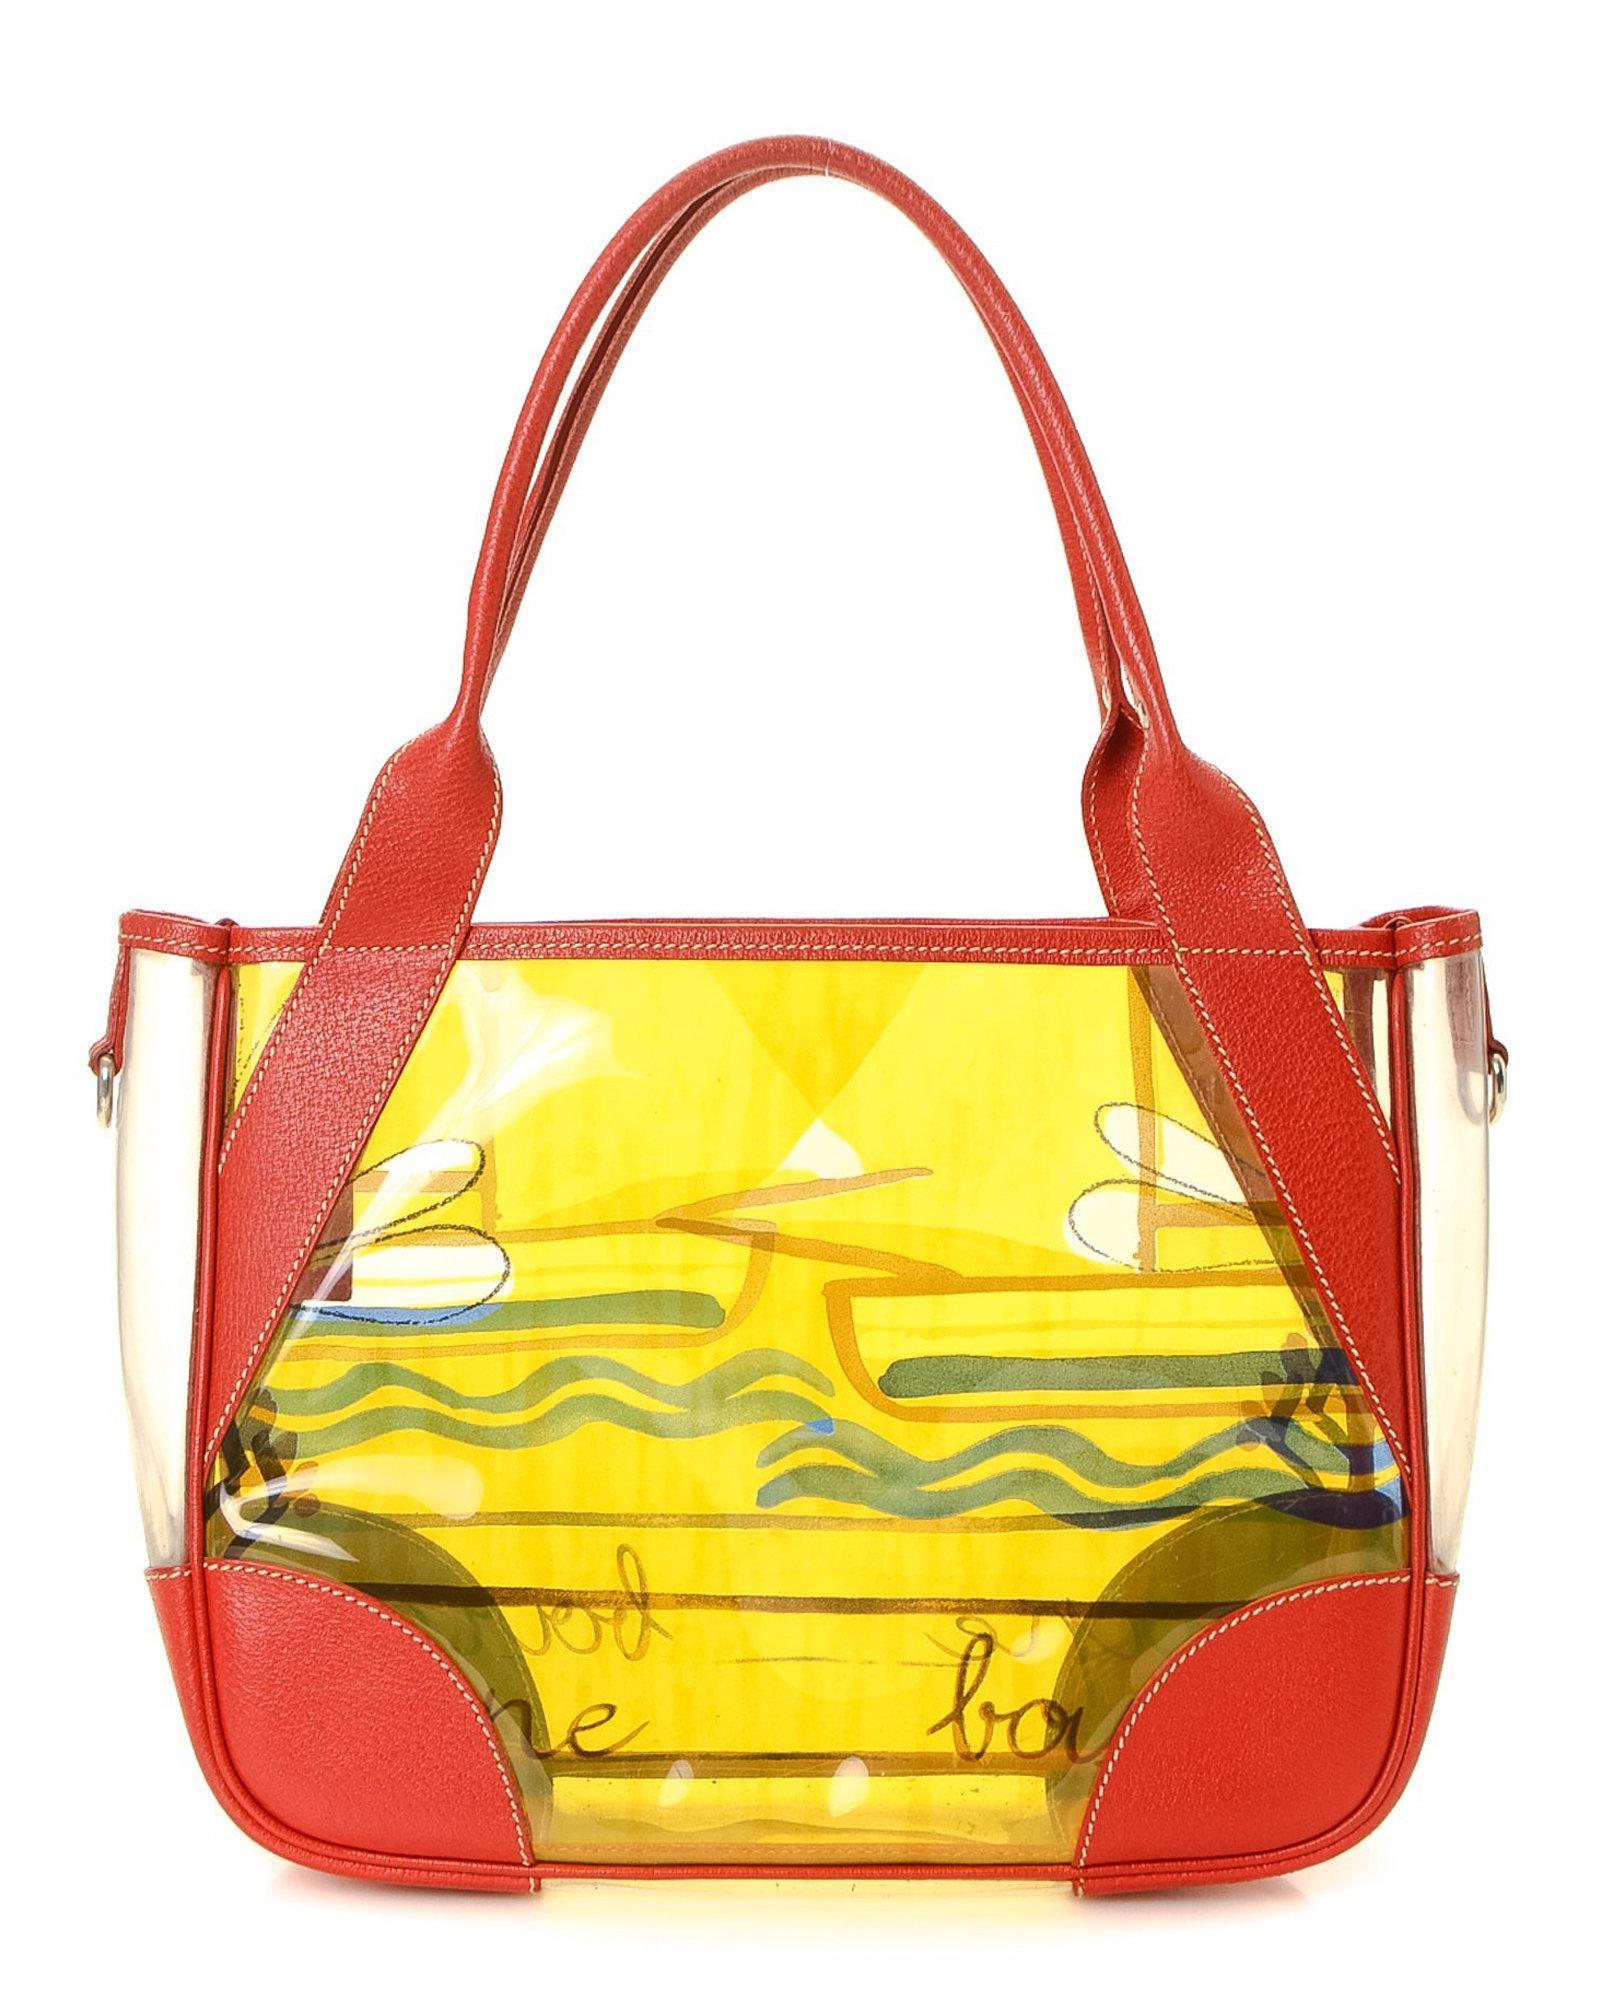 85c2737266e6 Prada Vinyl Handbag - Foto Handbag All Collections Salonagafiya.Com